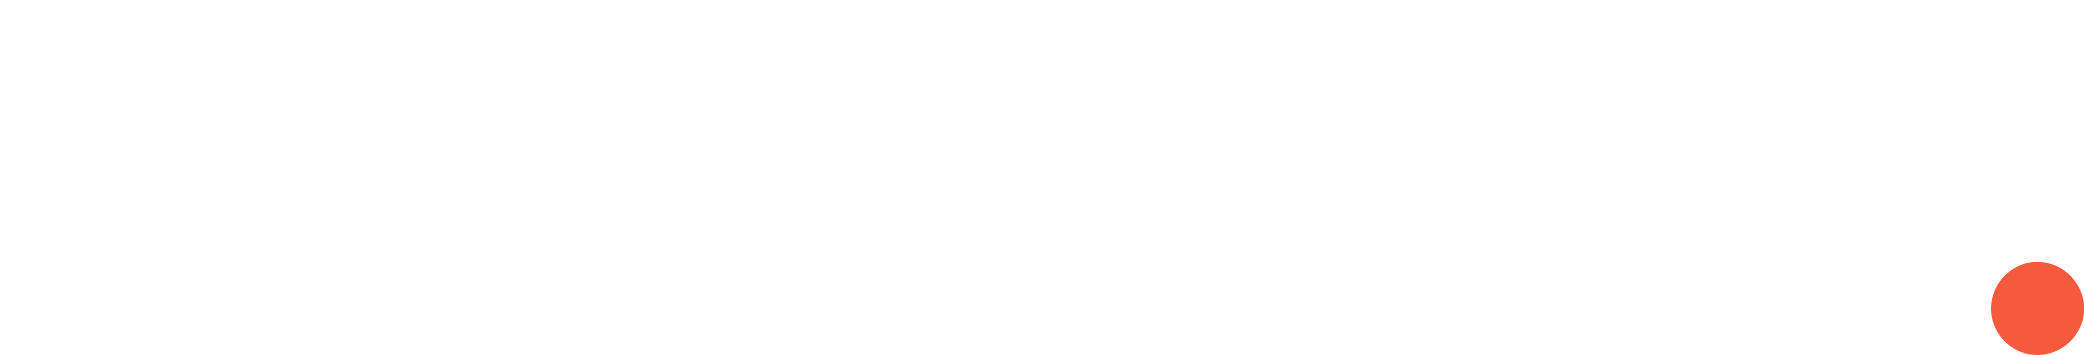 Netwise Blog